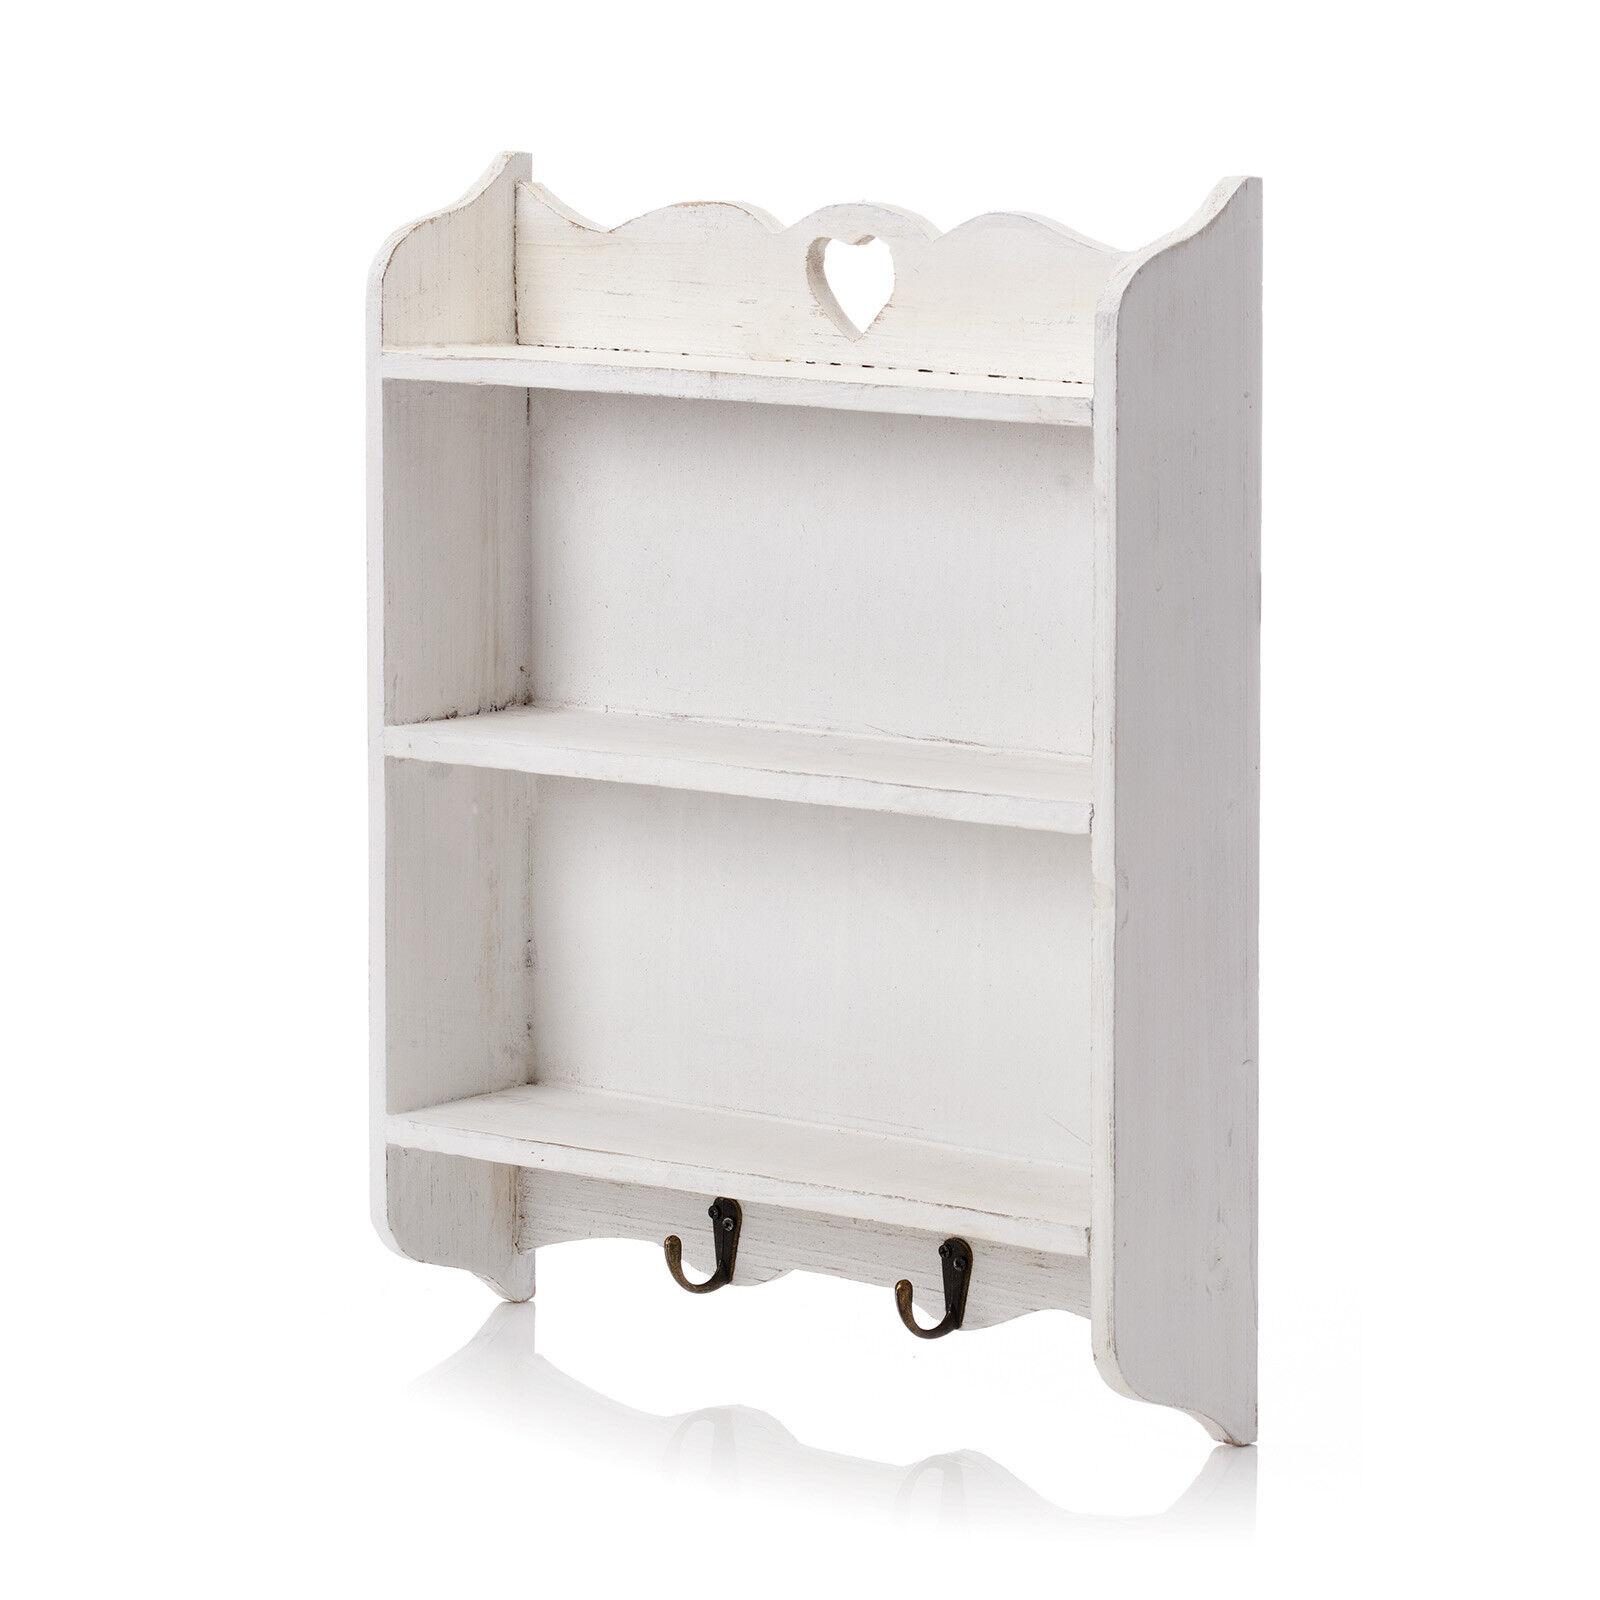 White Shabby Chic Shelf Unit Cabinet Storage Wall Mounted Rack Kitchen Home